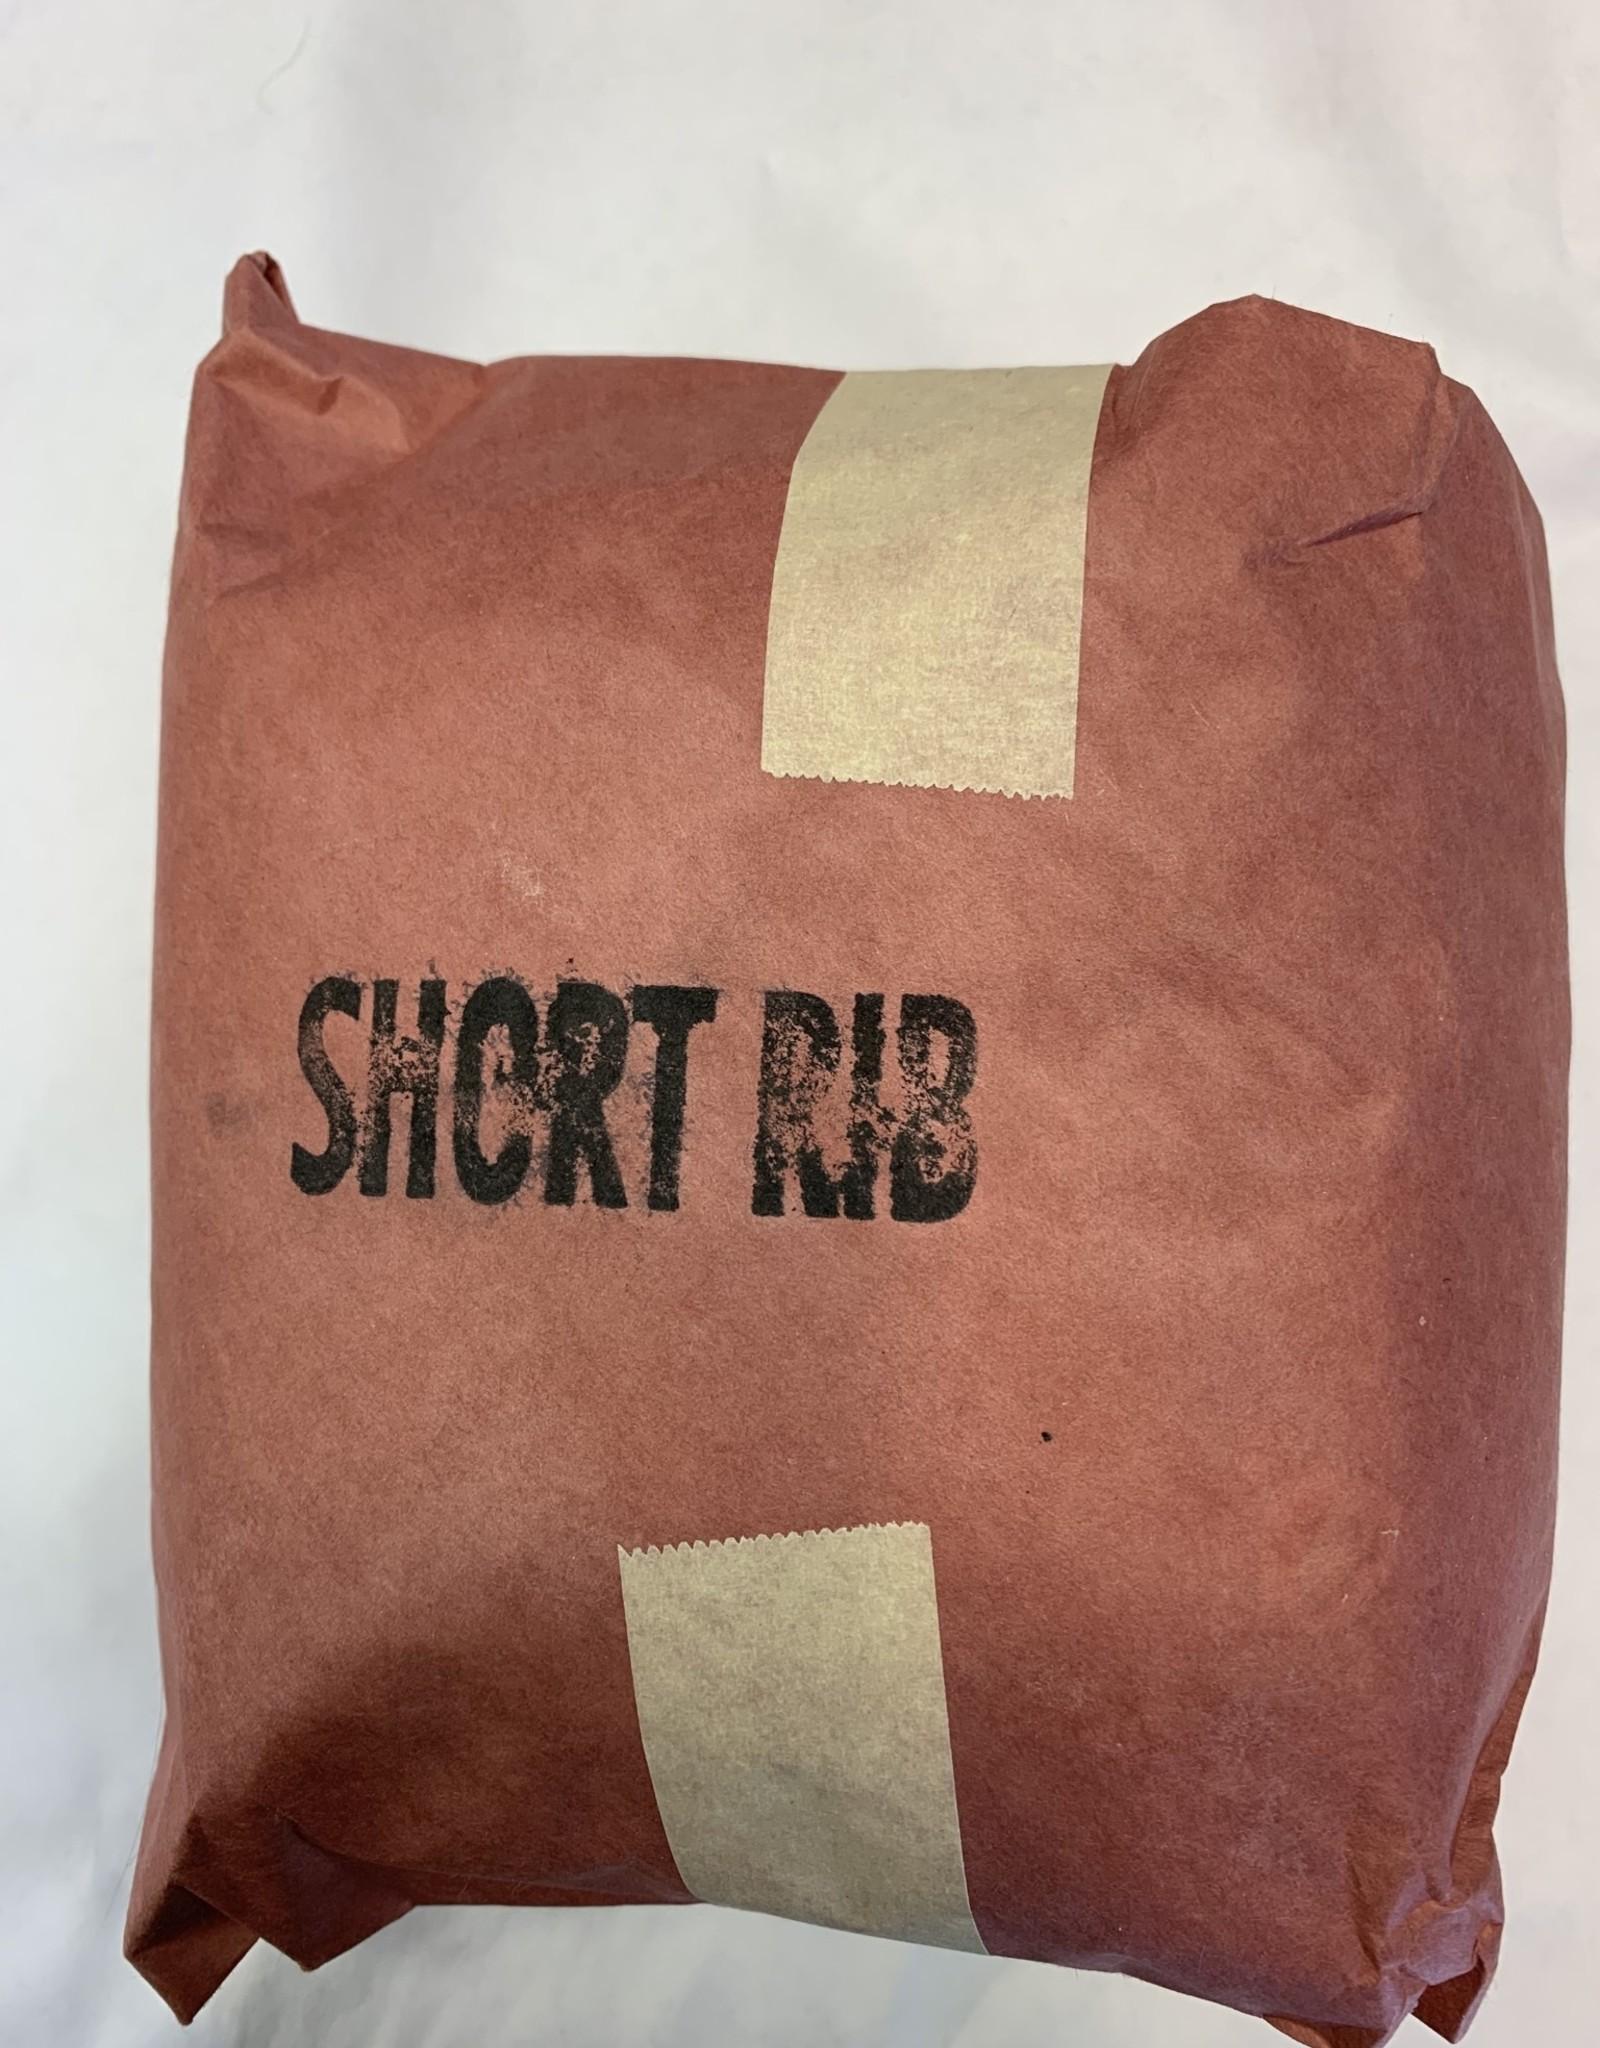 Heritage Short Rib Roast